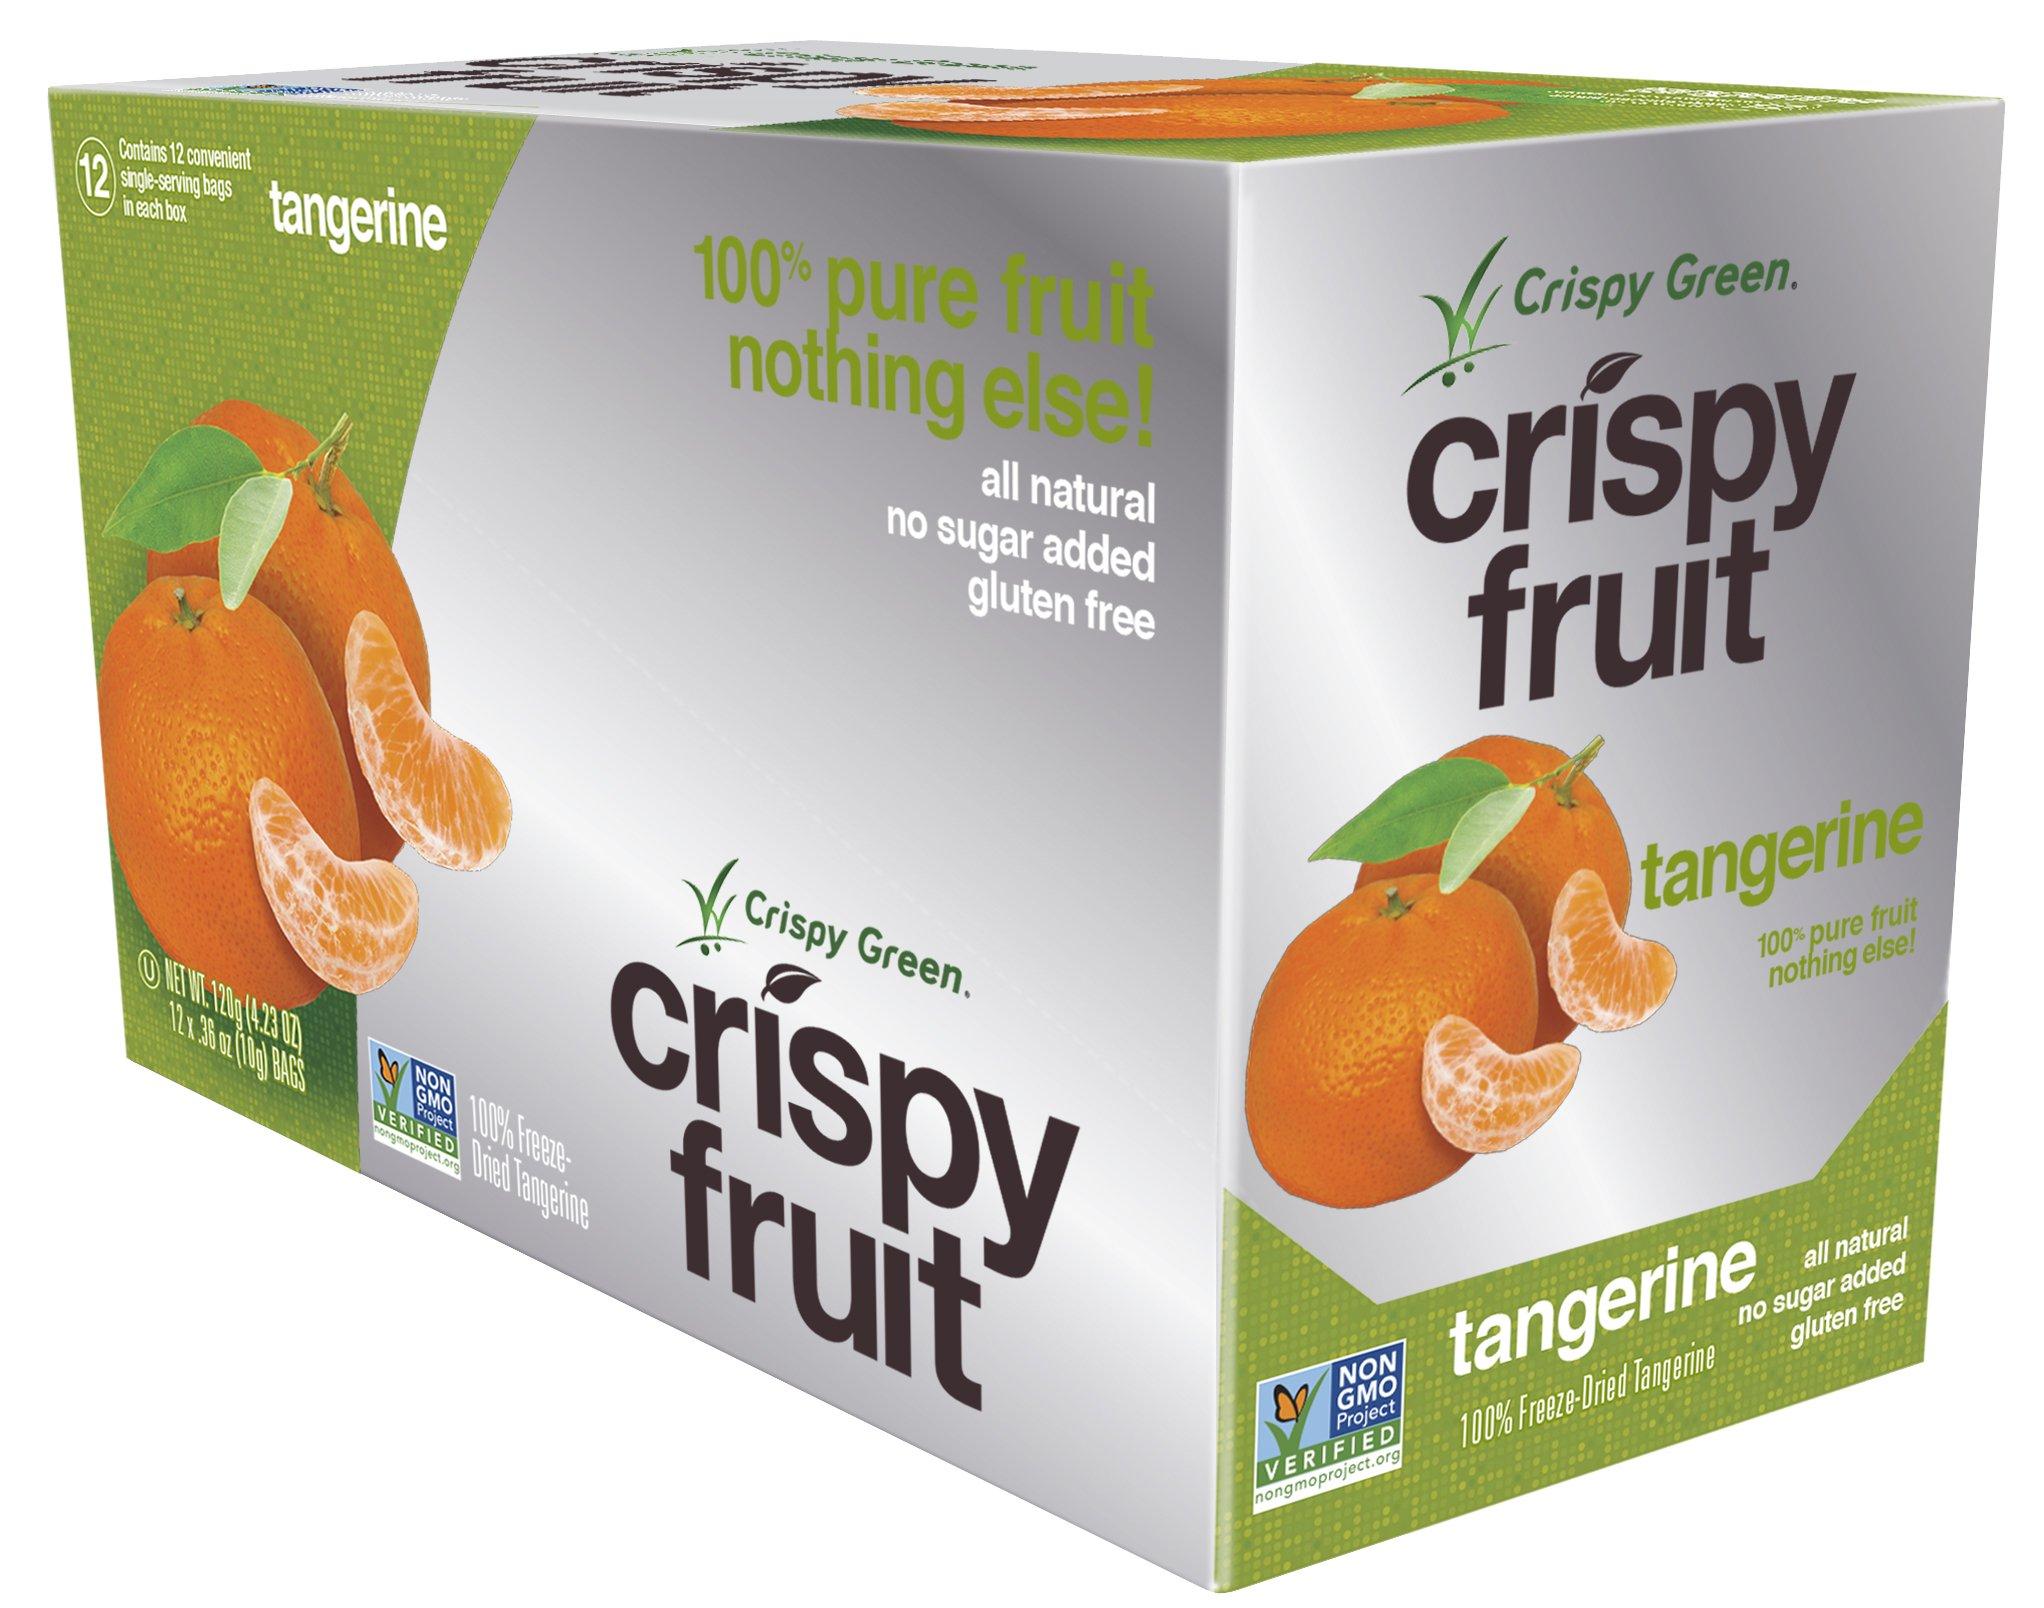 Crispy Green Freeze-Dried Fruits, Non-GMO, Gluten Free, No Sugar Added, Tangerine, 0.36 Ounce (12 Count)